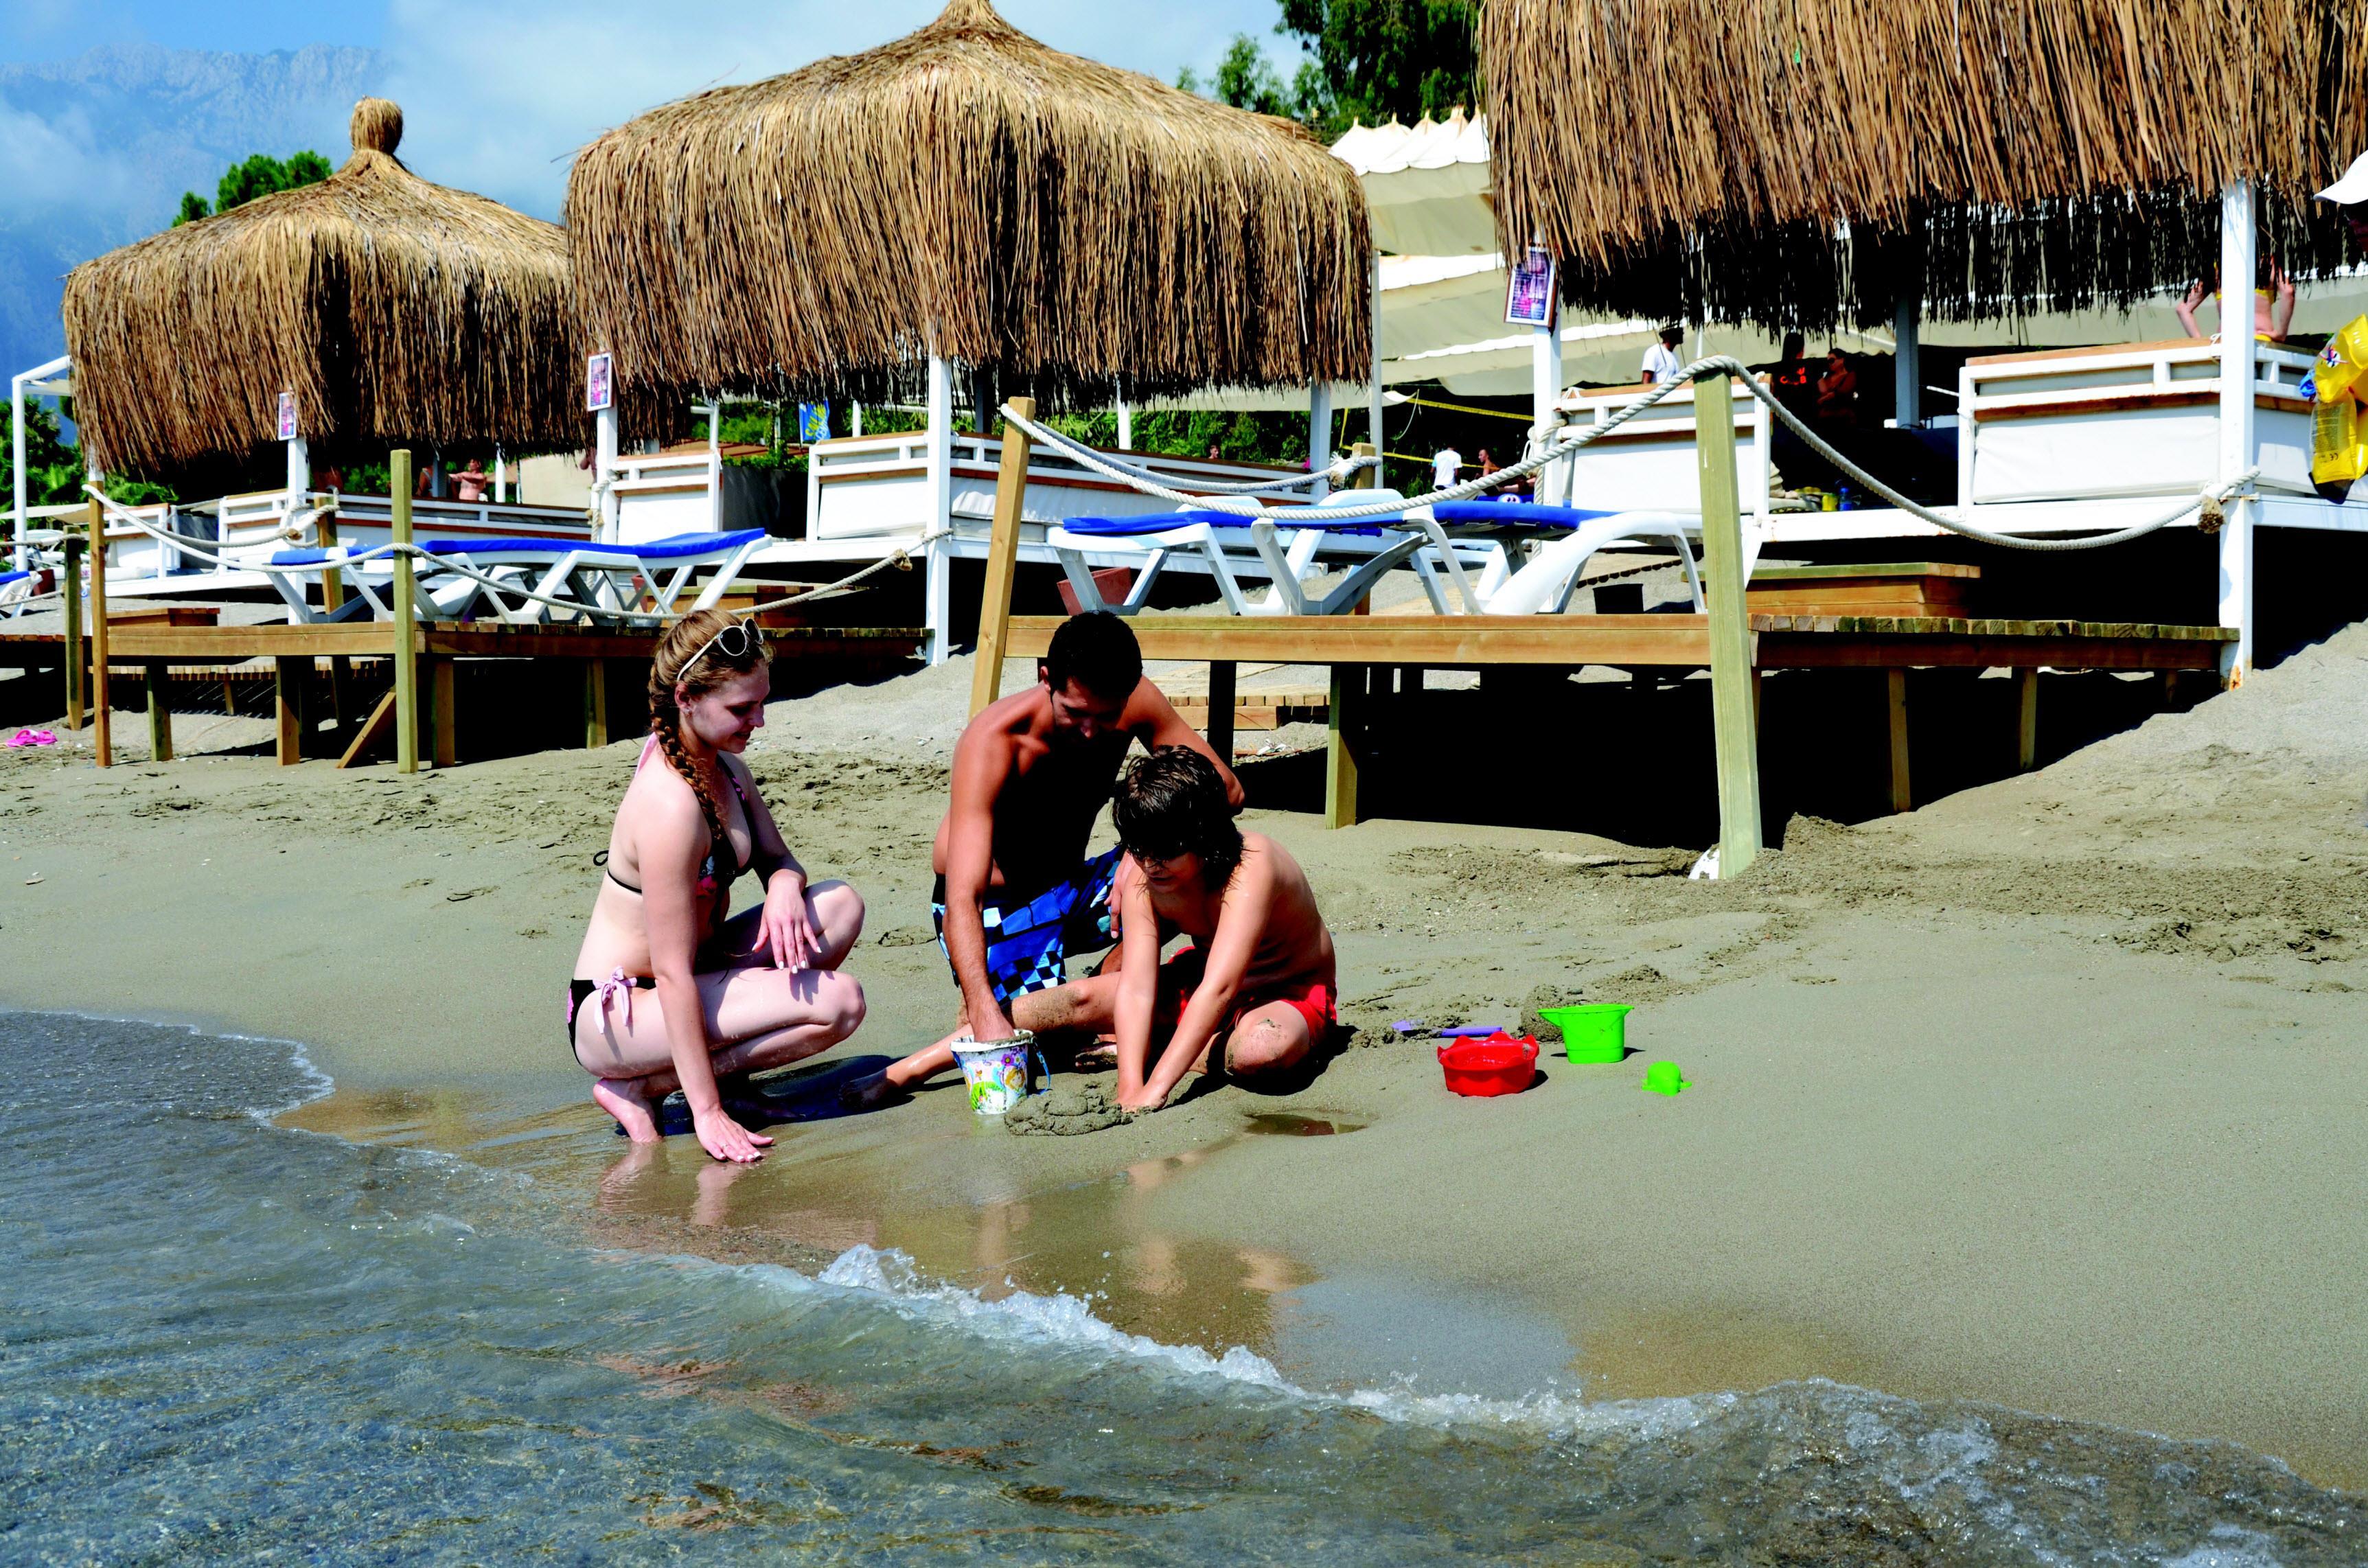 http://www.orextravel.sk/OREX/hotelphotos/ulusoy-kemer-holiday-club-area-0012.jpg